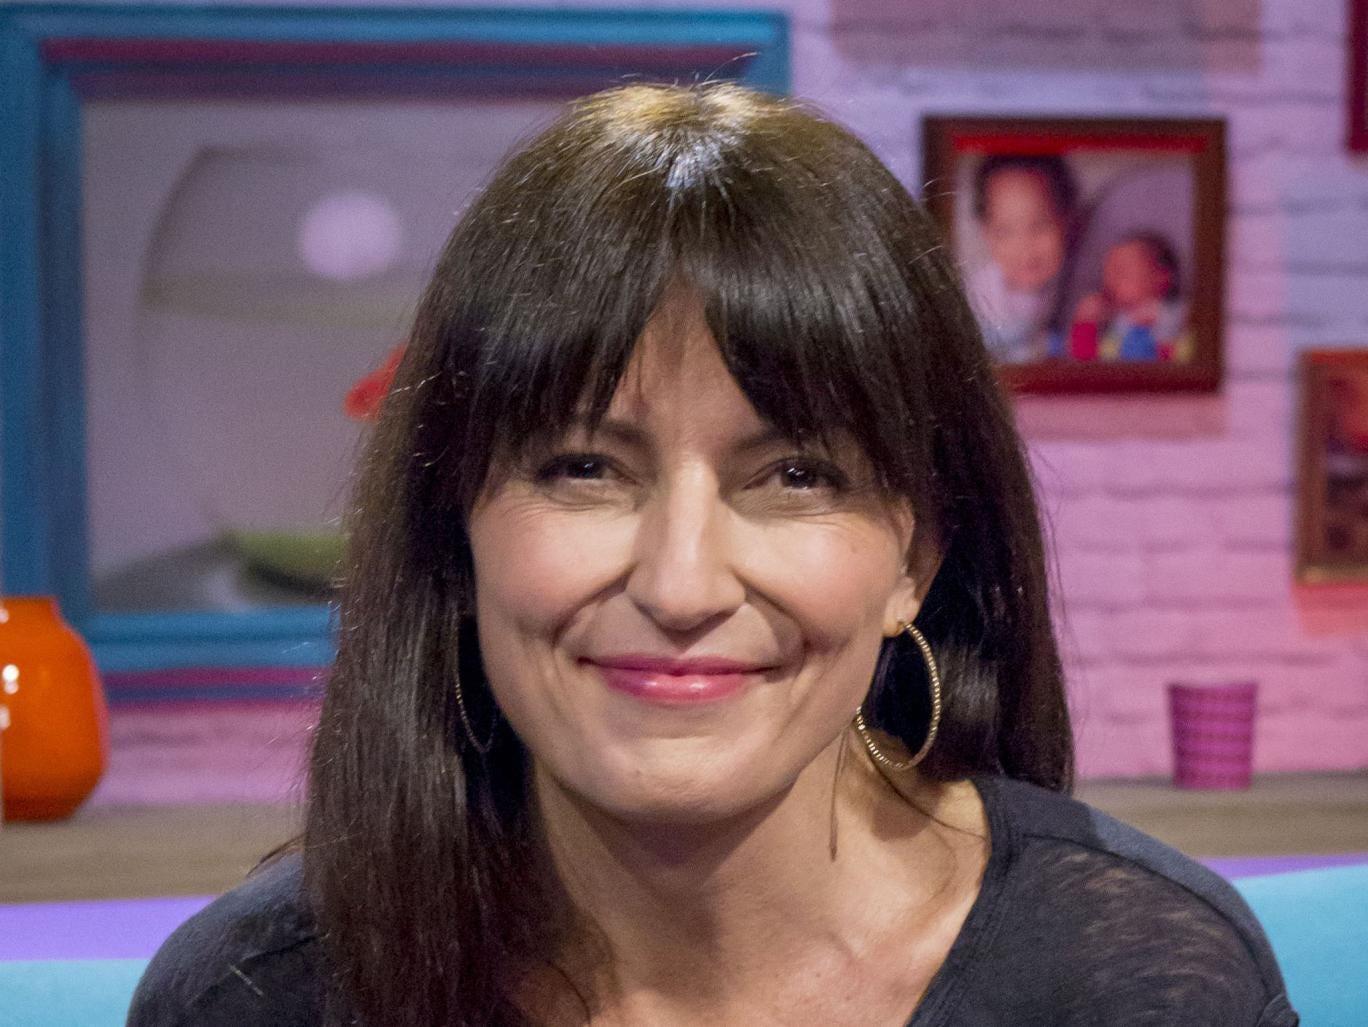 Davina Mccall Confesses She Still Attends Narcotics